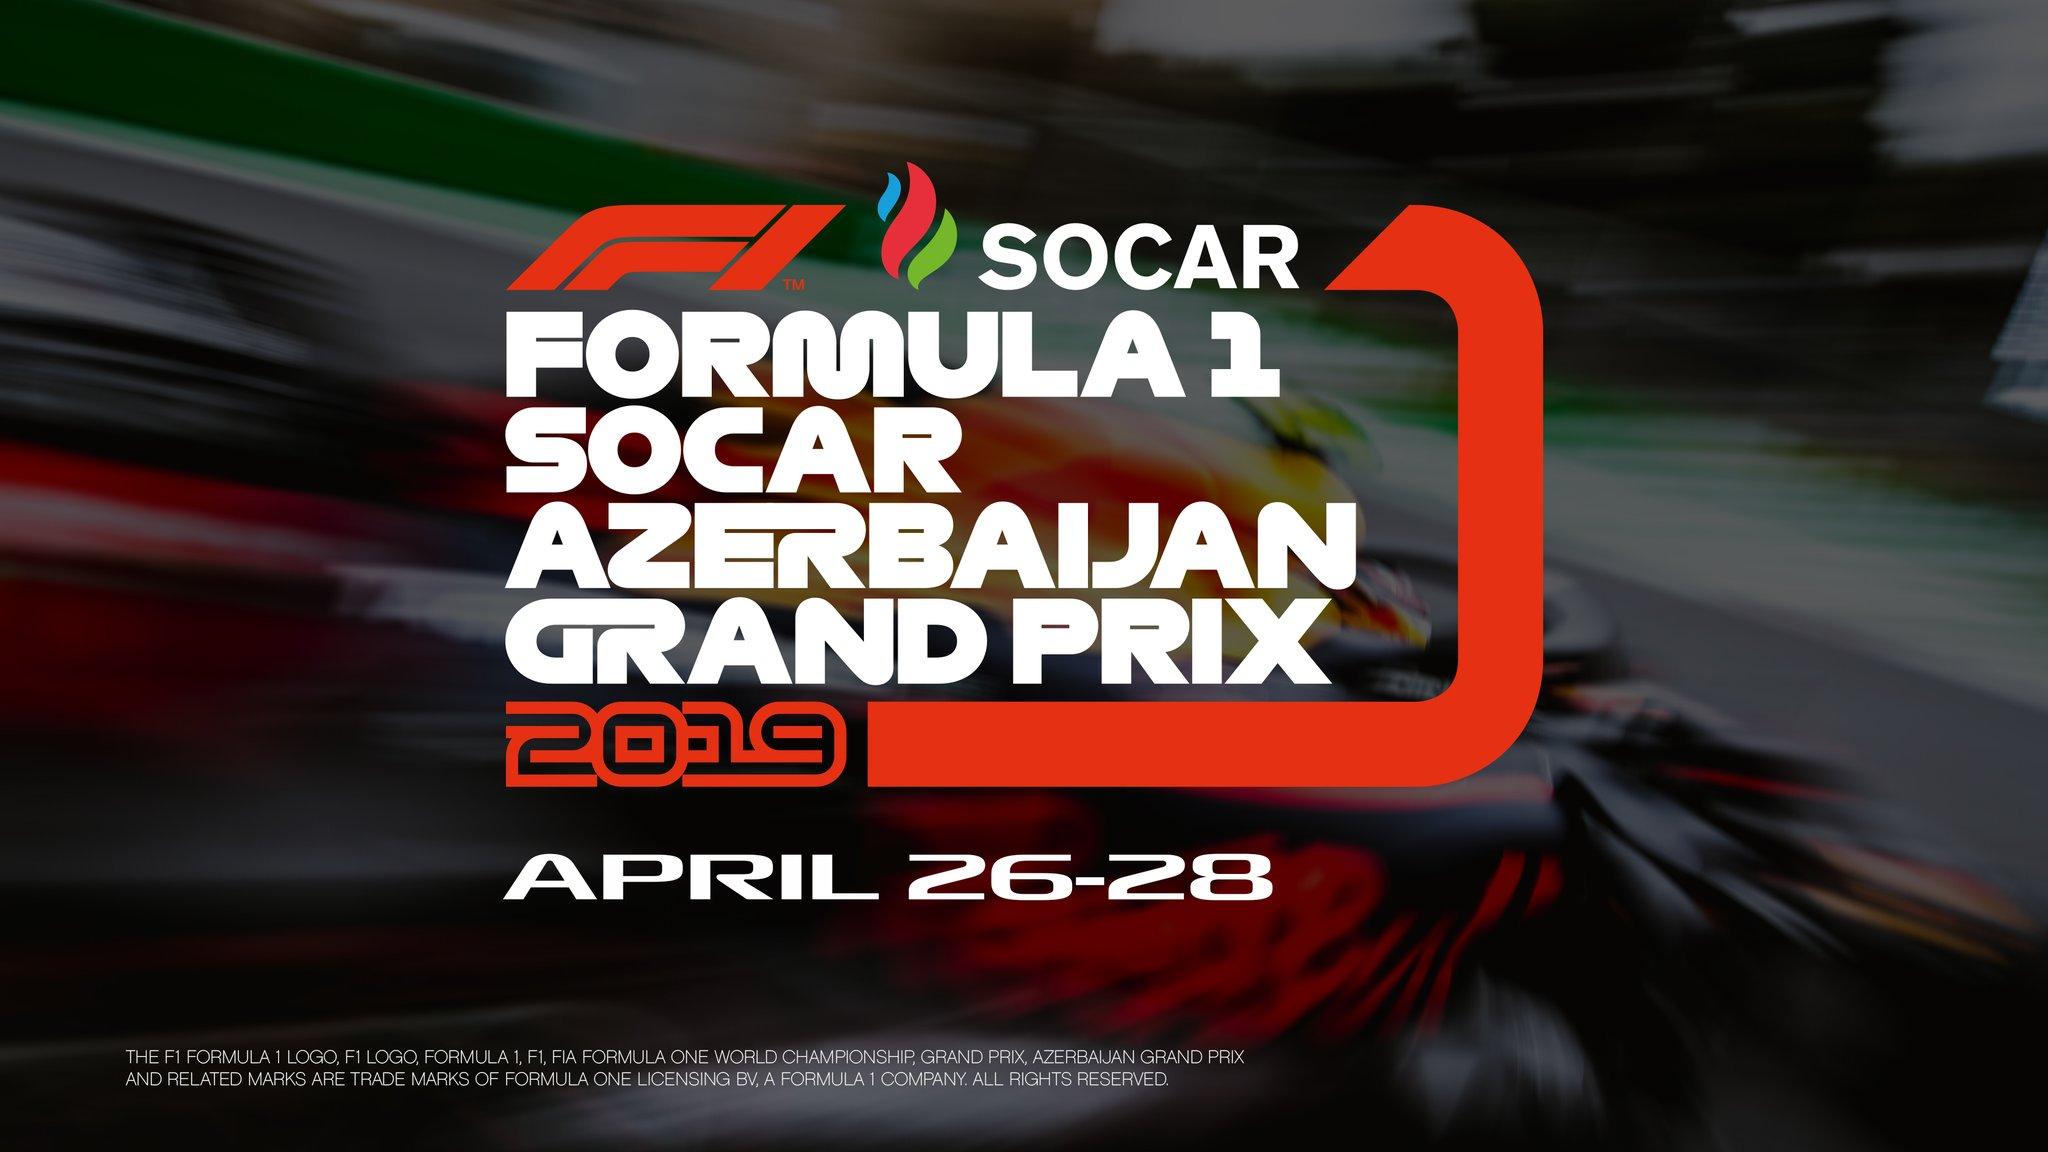 Présentation du Grand Prix d'Azerbaïdjan